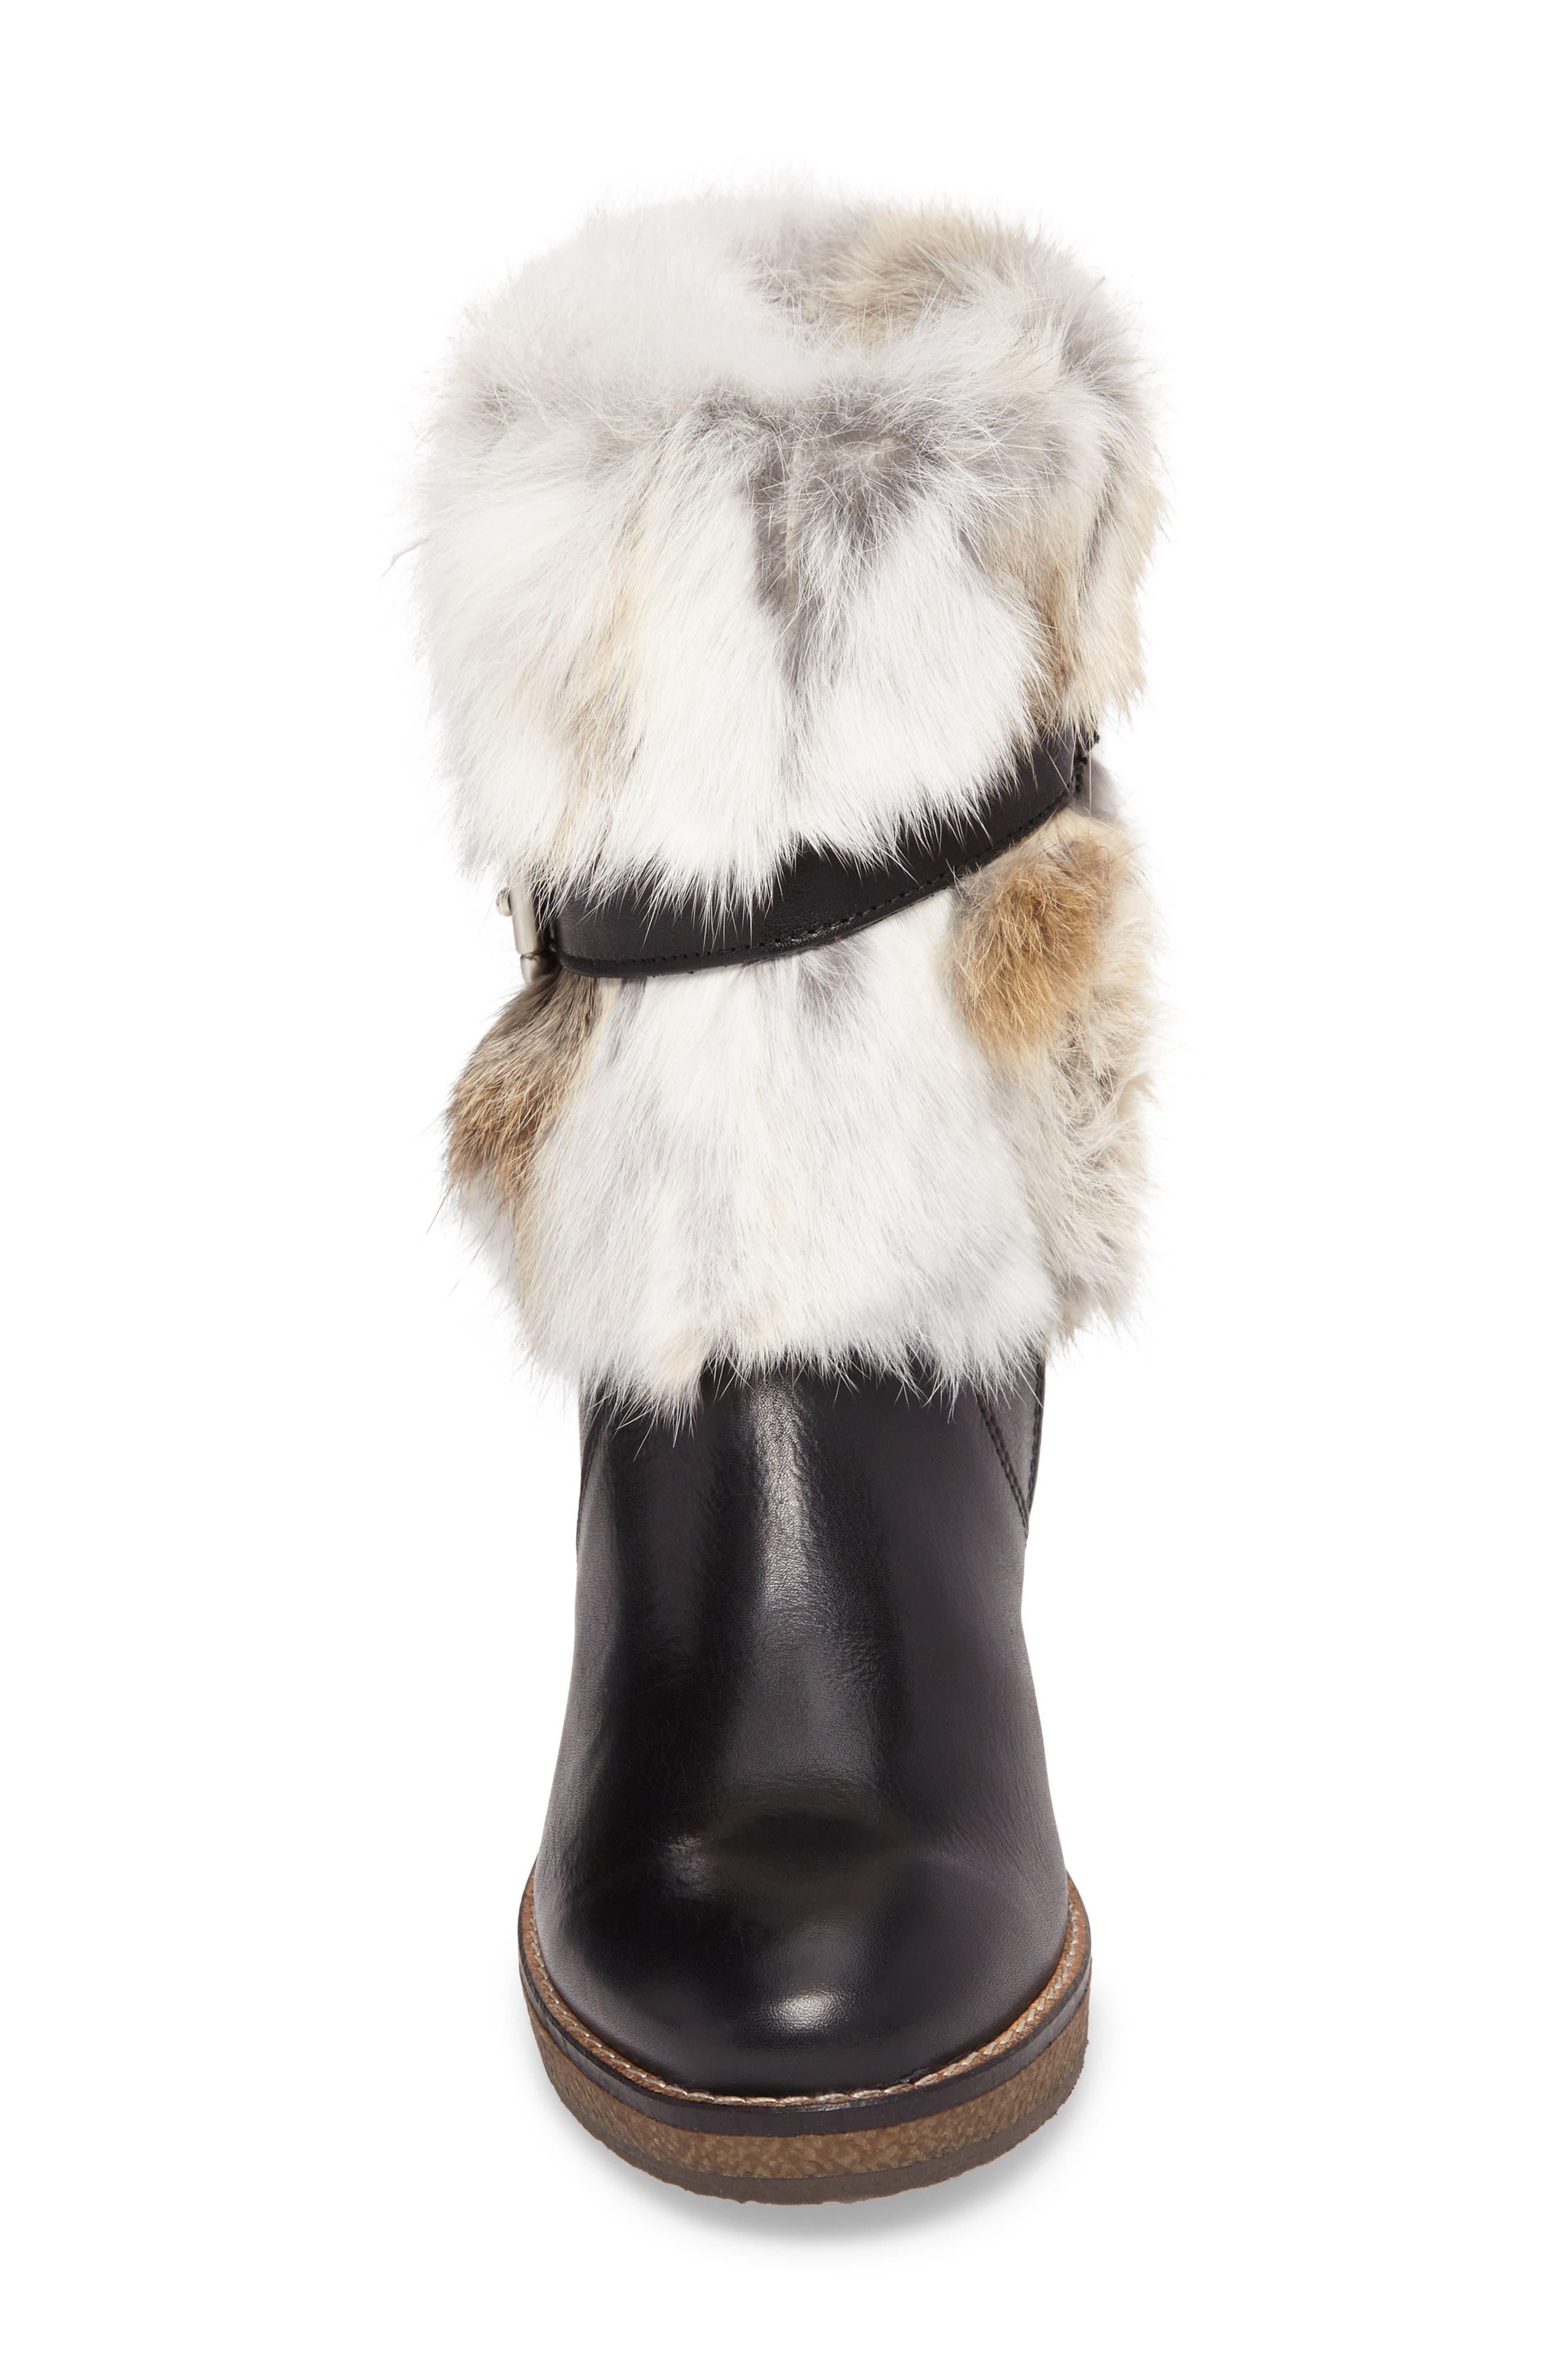 Tasarla Genuine Rabbit Fur Trim Boot,                             Alternate thumbnail 4, color,                             001